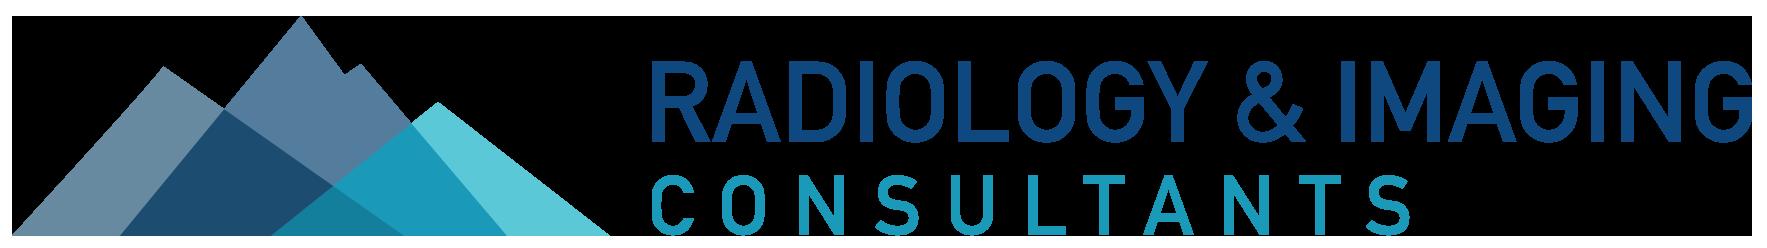 Radiology & Imaging Consultants, P.C.